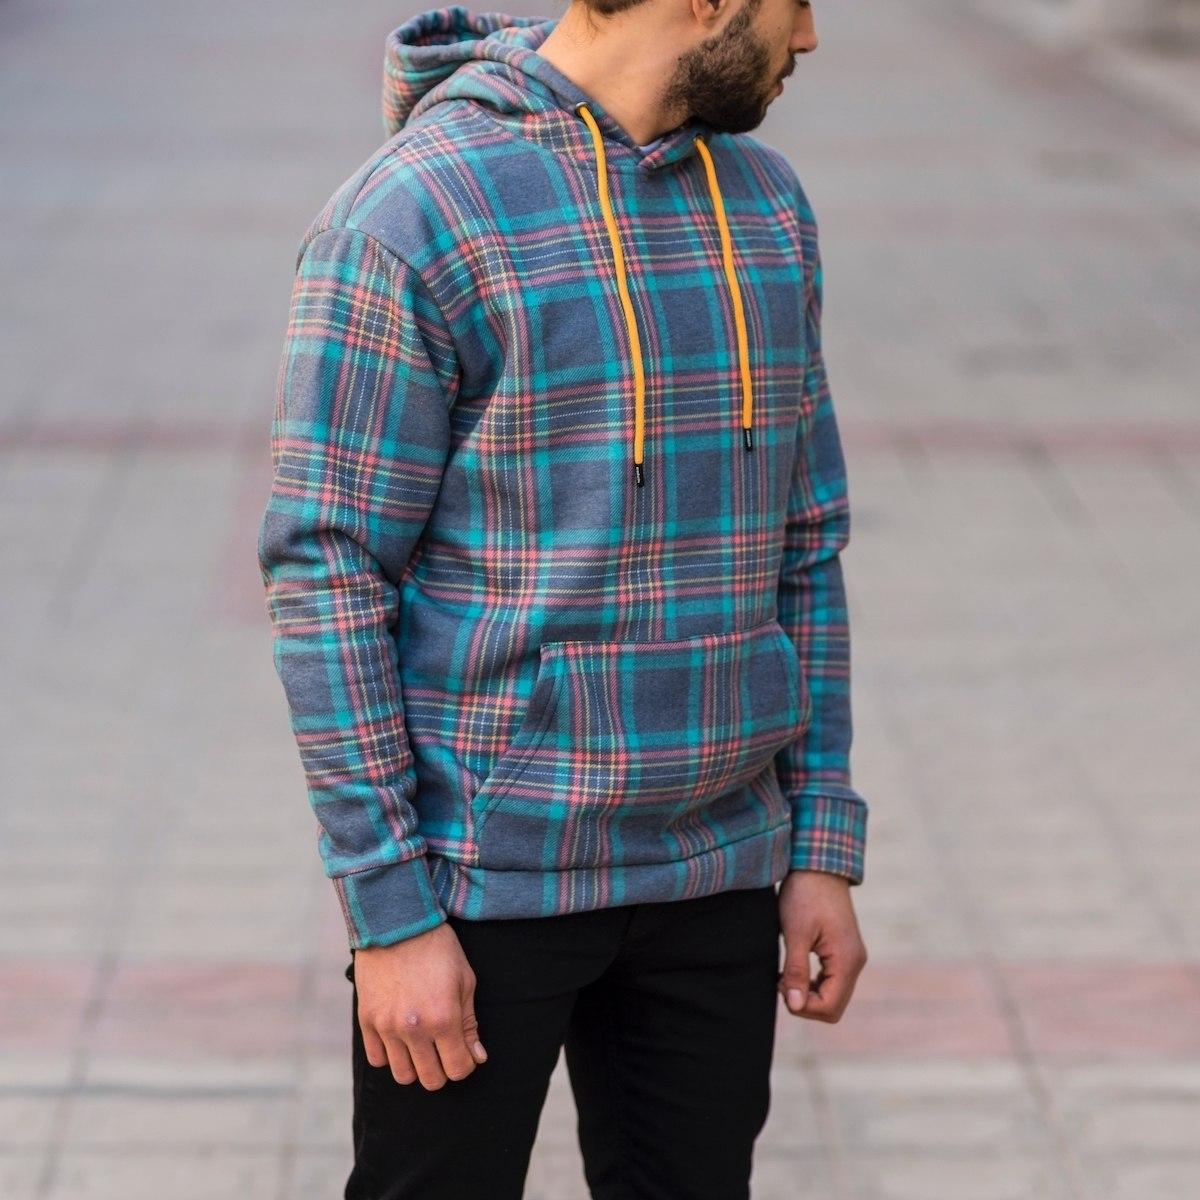 Men's Plaid Sweatshirt In Blue